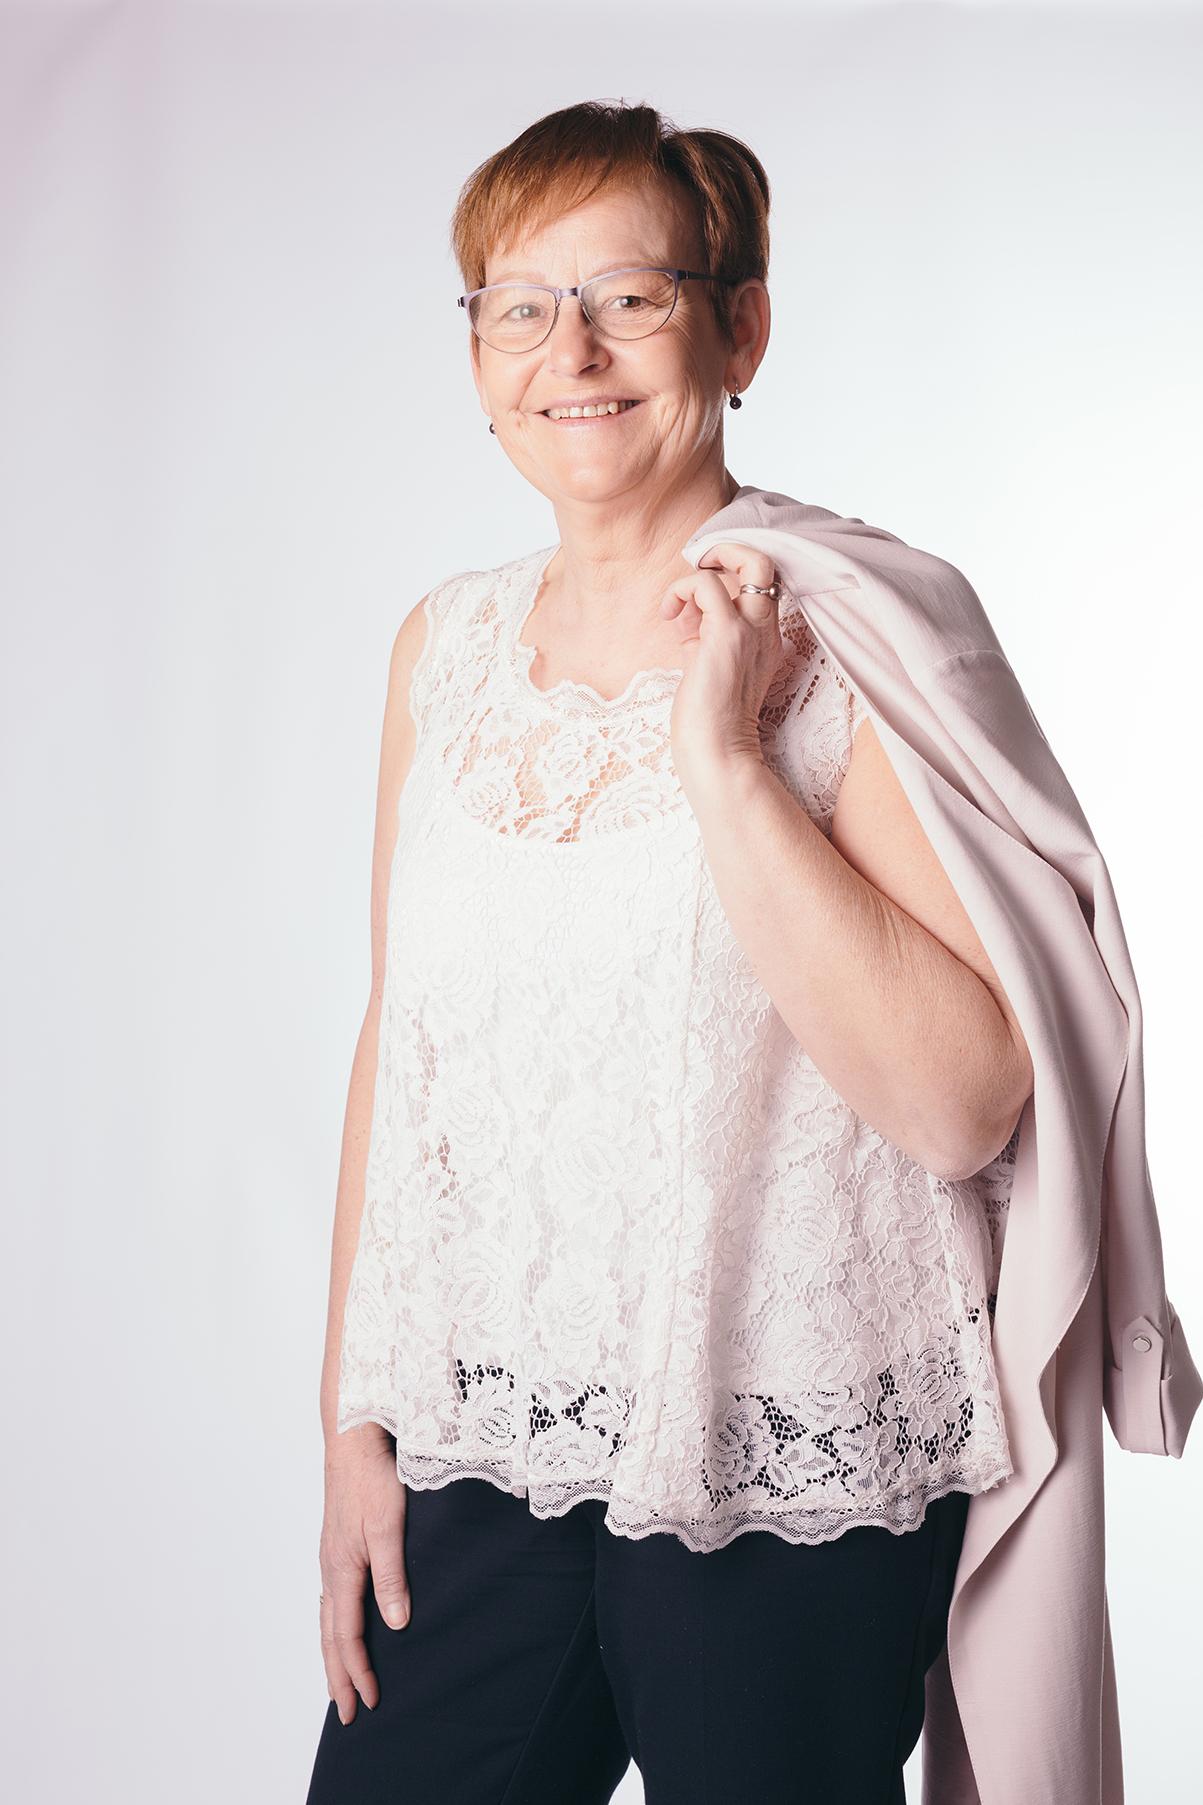 Marie-Berthe Wyns